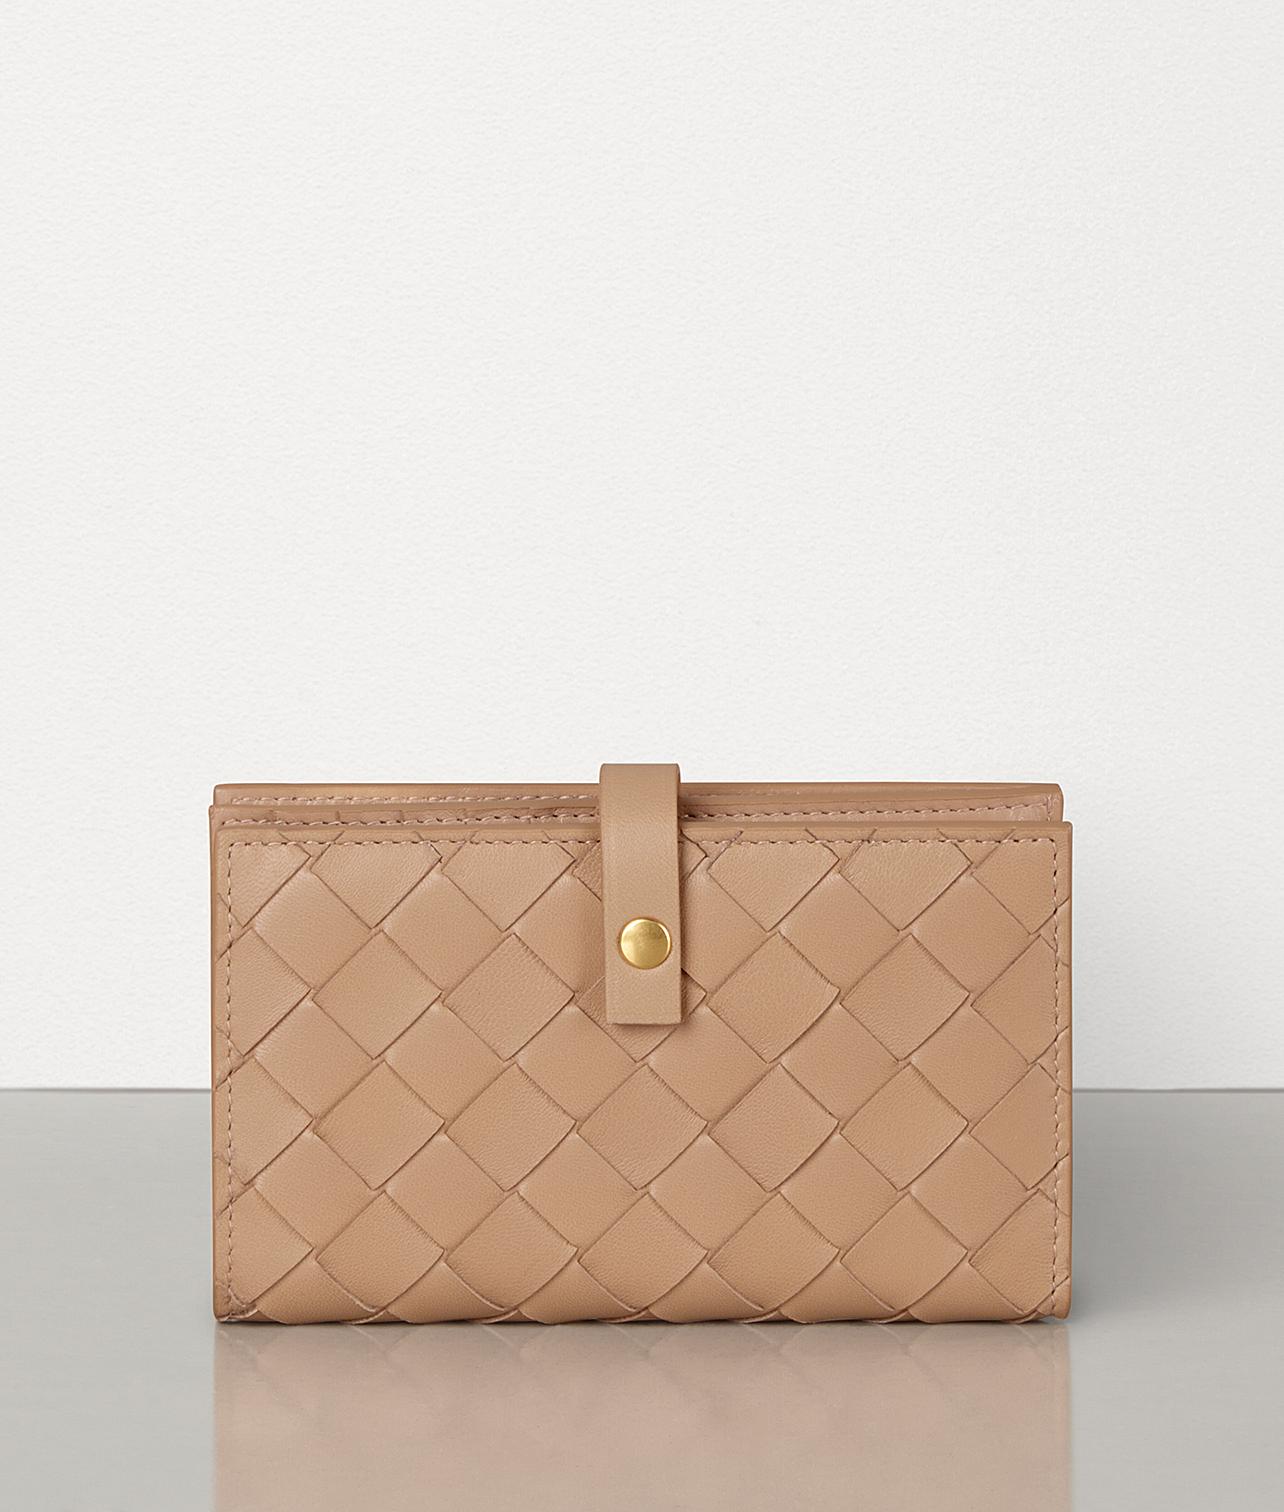 「Bottega Veneta(ボッテガ・ヴェネタ)」オススメの二つ折り財布